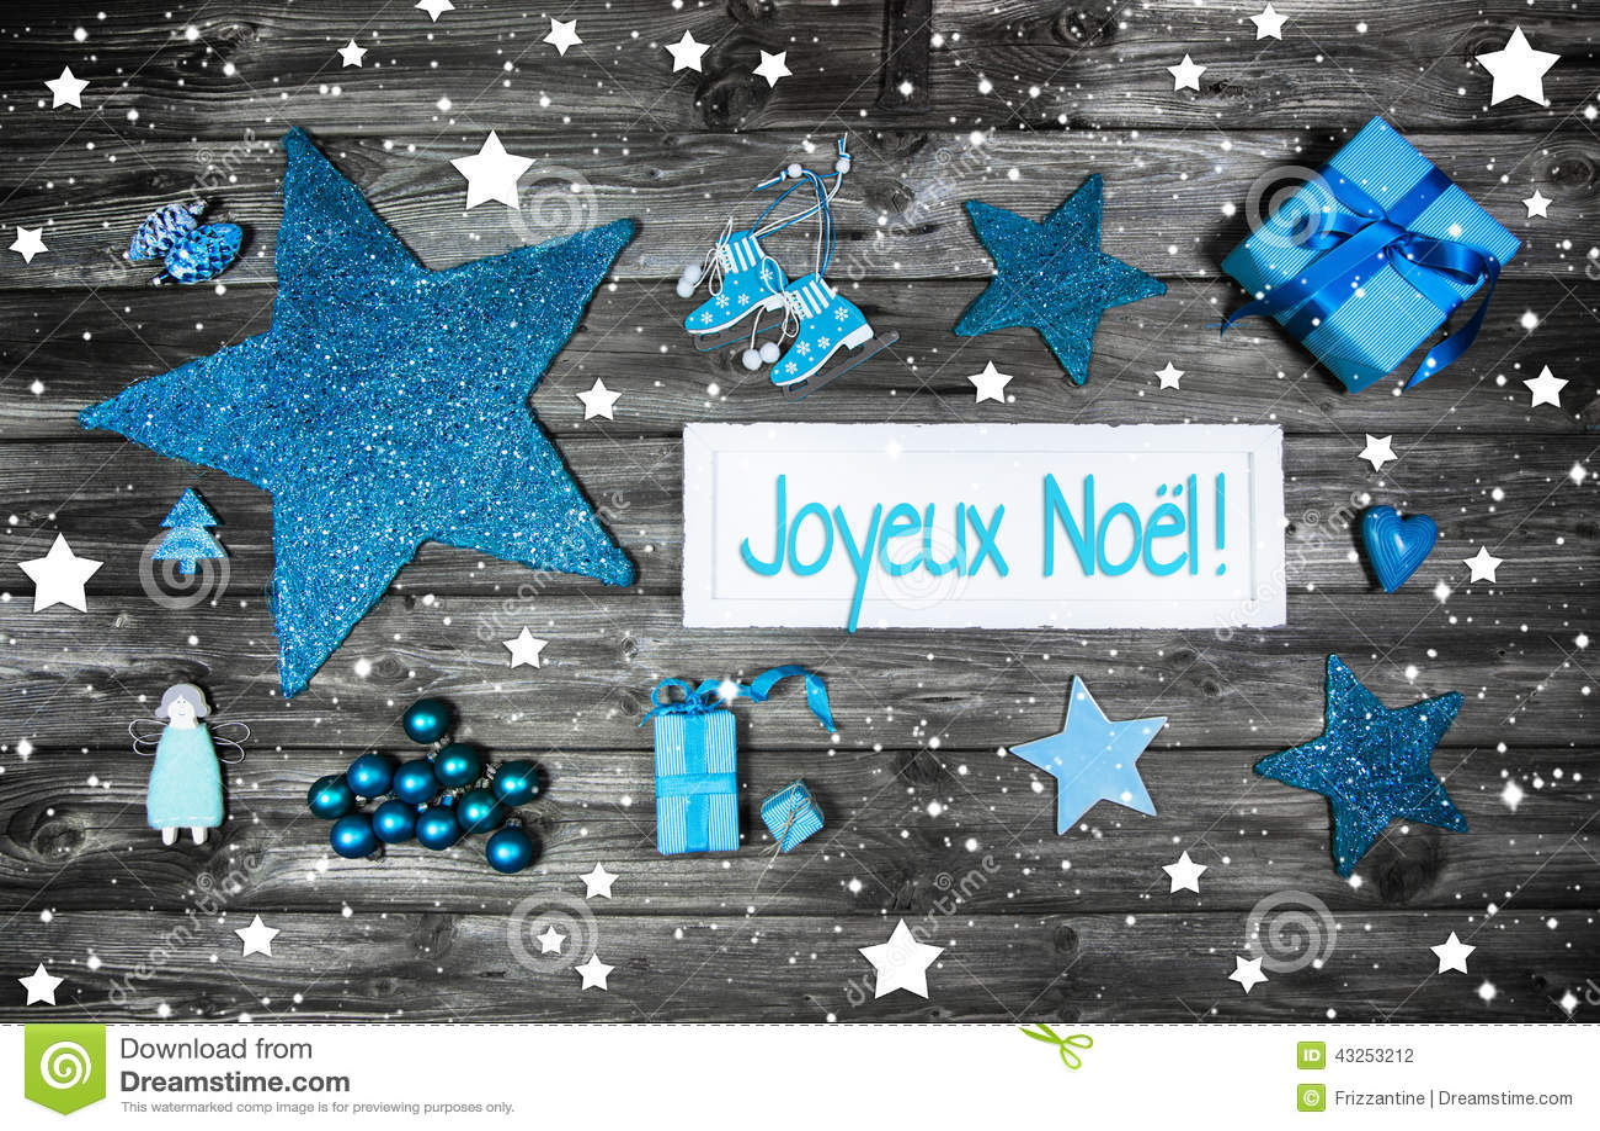 #1492B7 Merry Christmas Card Or Voucher. Xmas Decoration In Blue  6361 décoration noel commerce 1300x936 px @ aertt.com